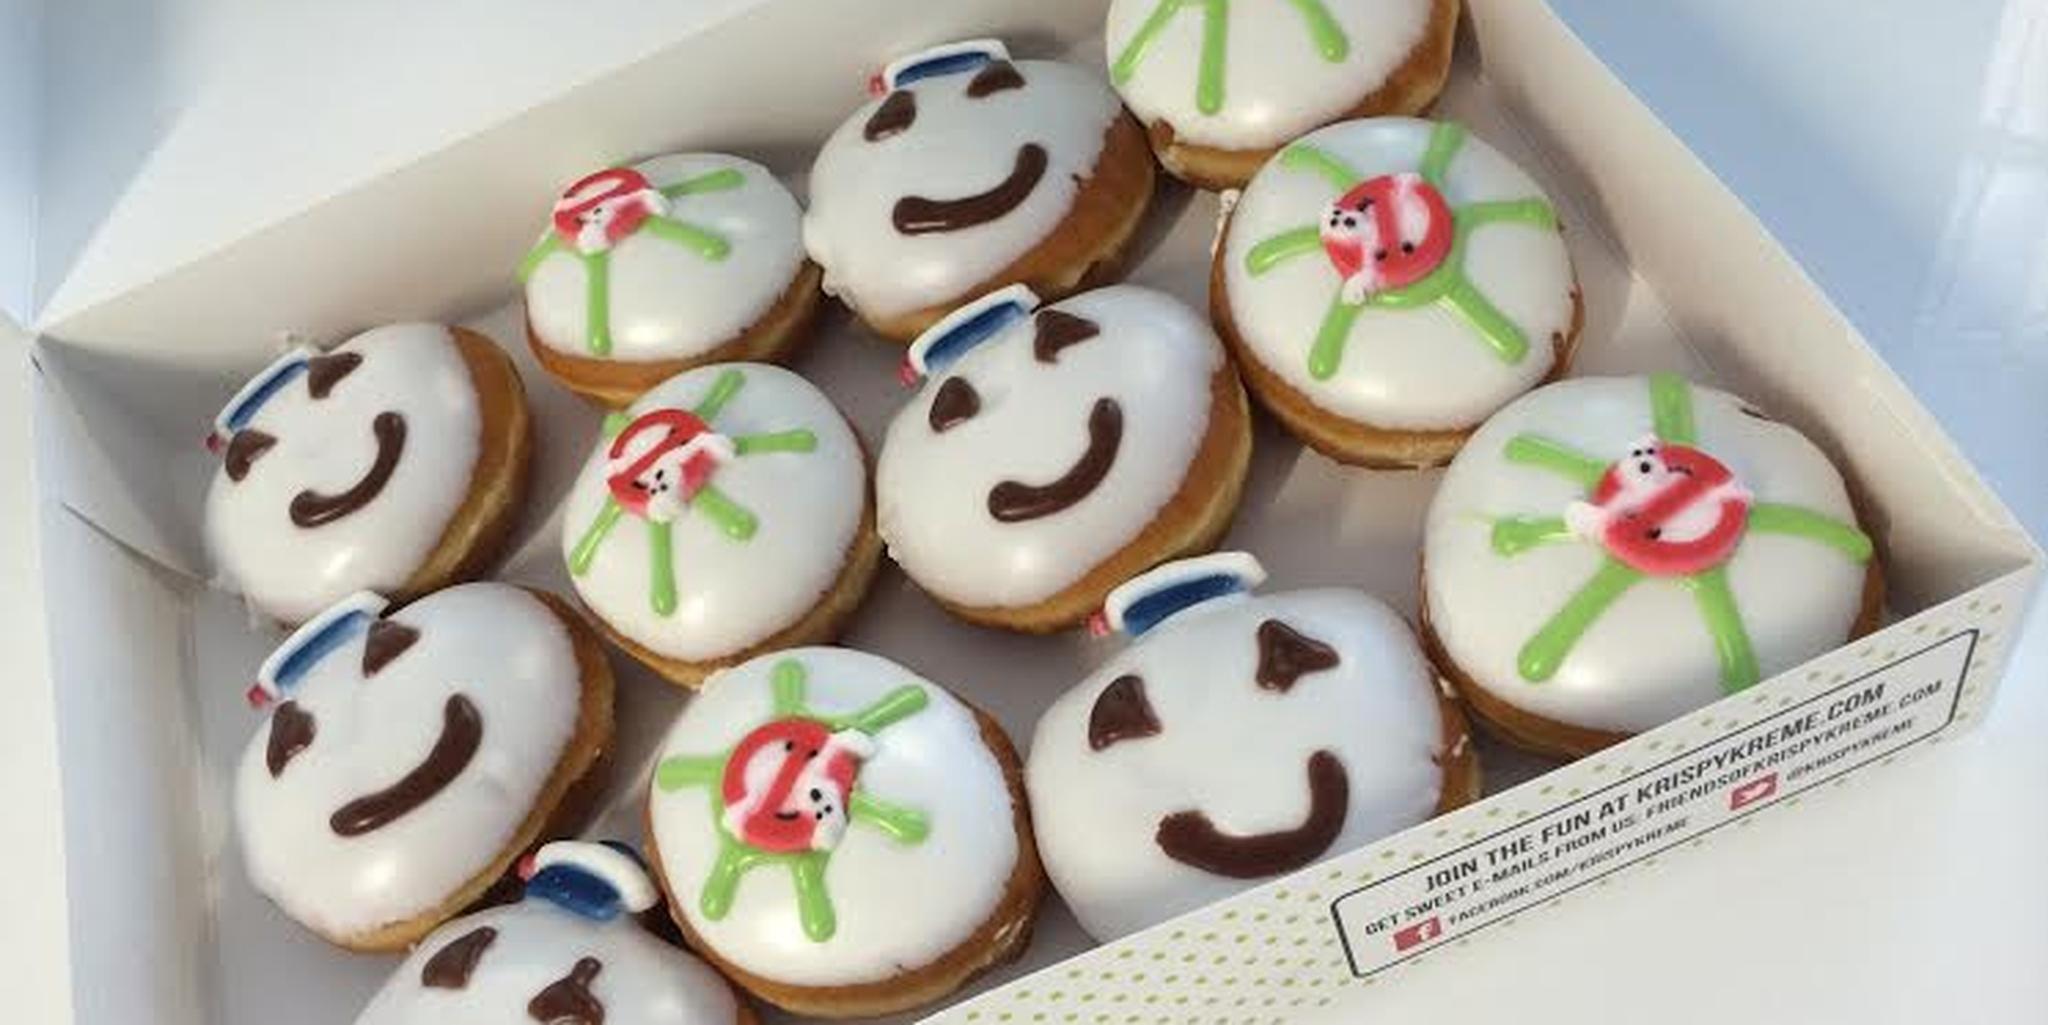 Krispy Kreme Ghostbuster Doughnuts